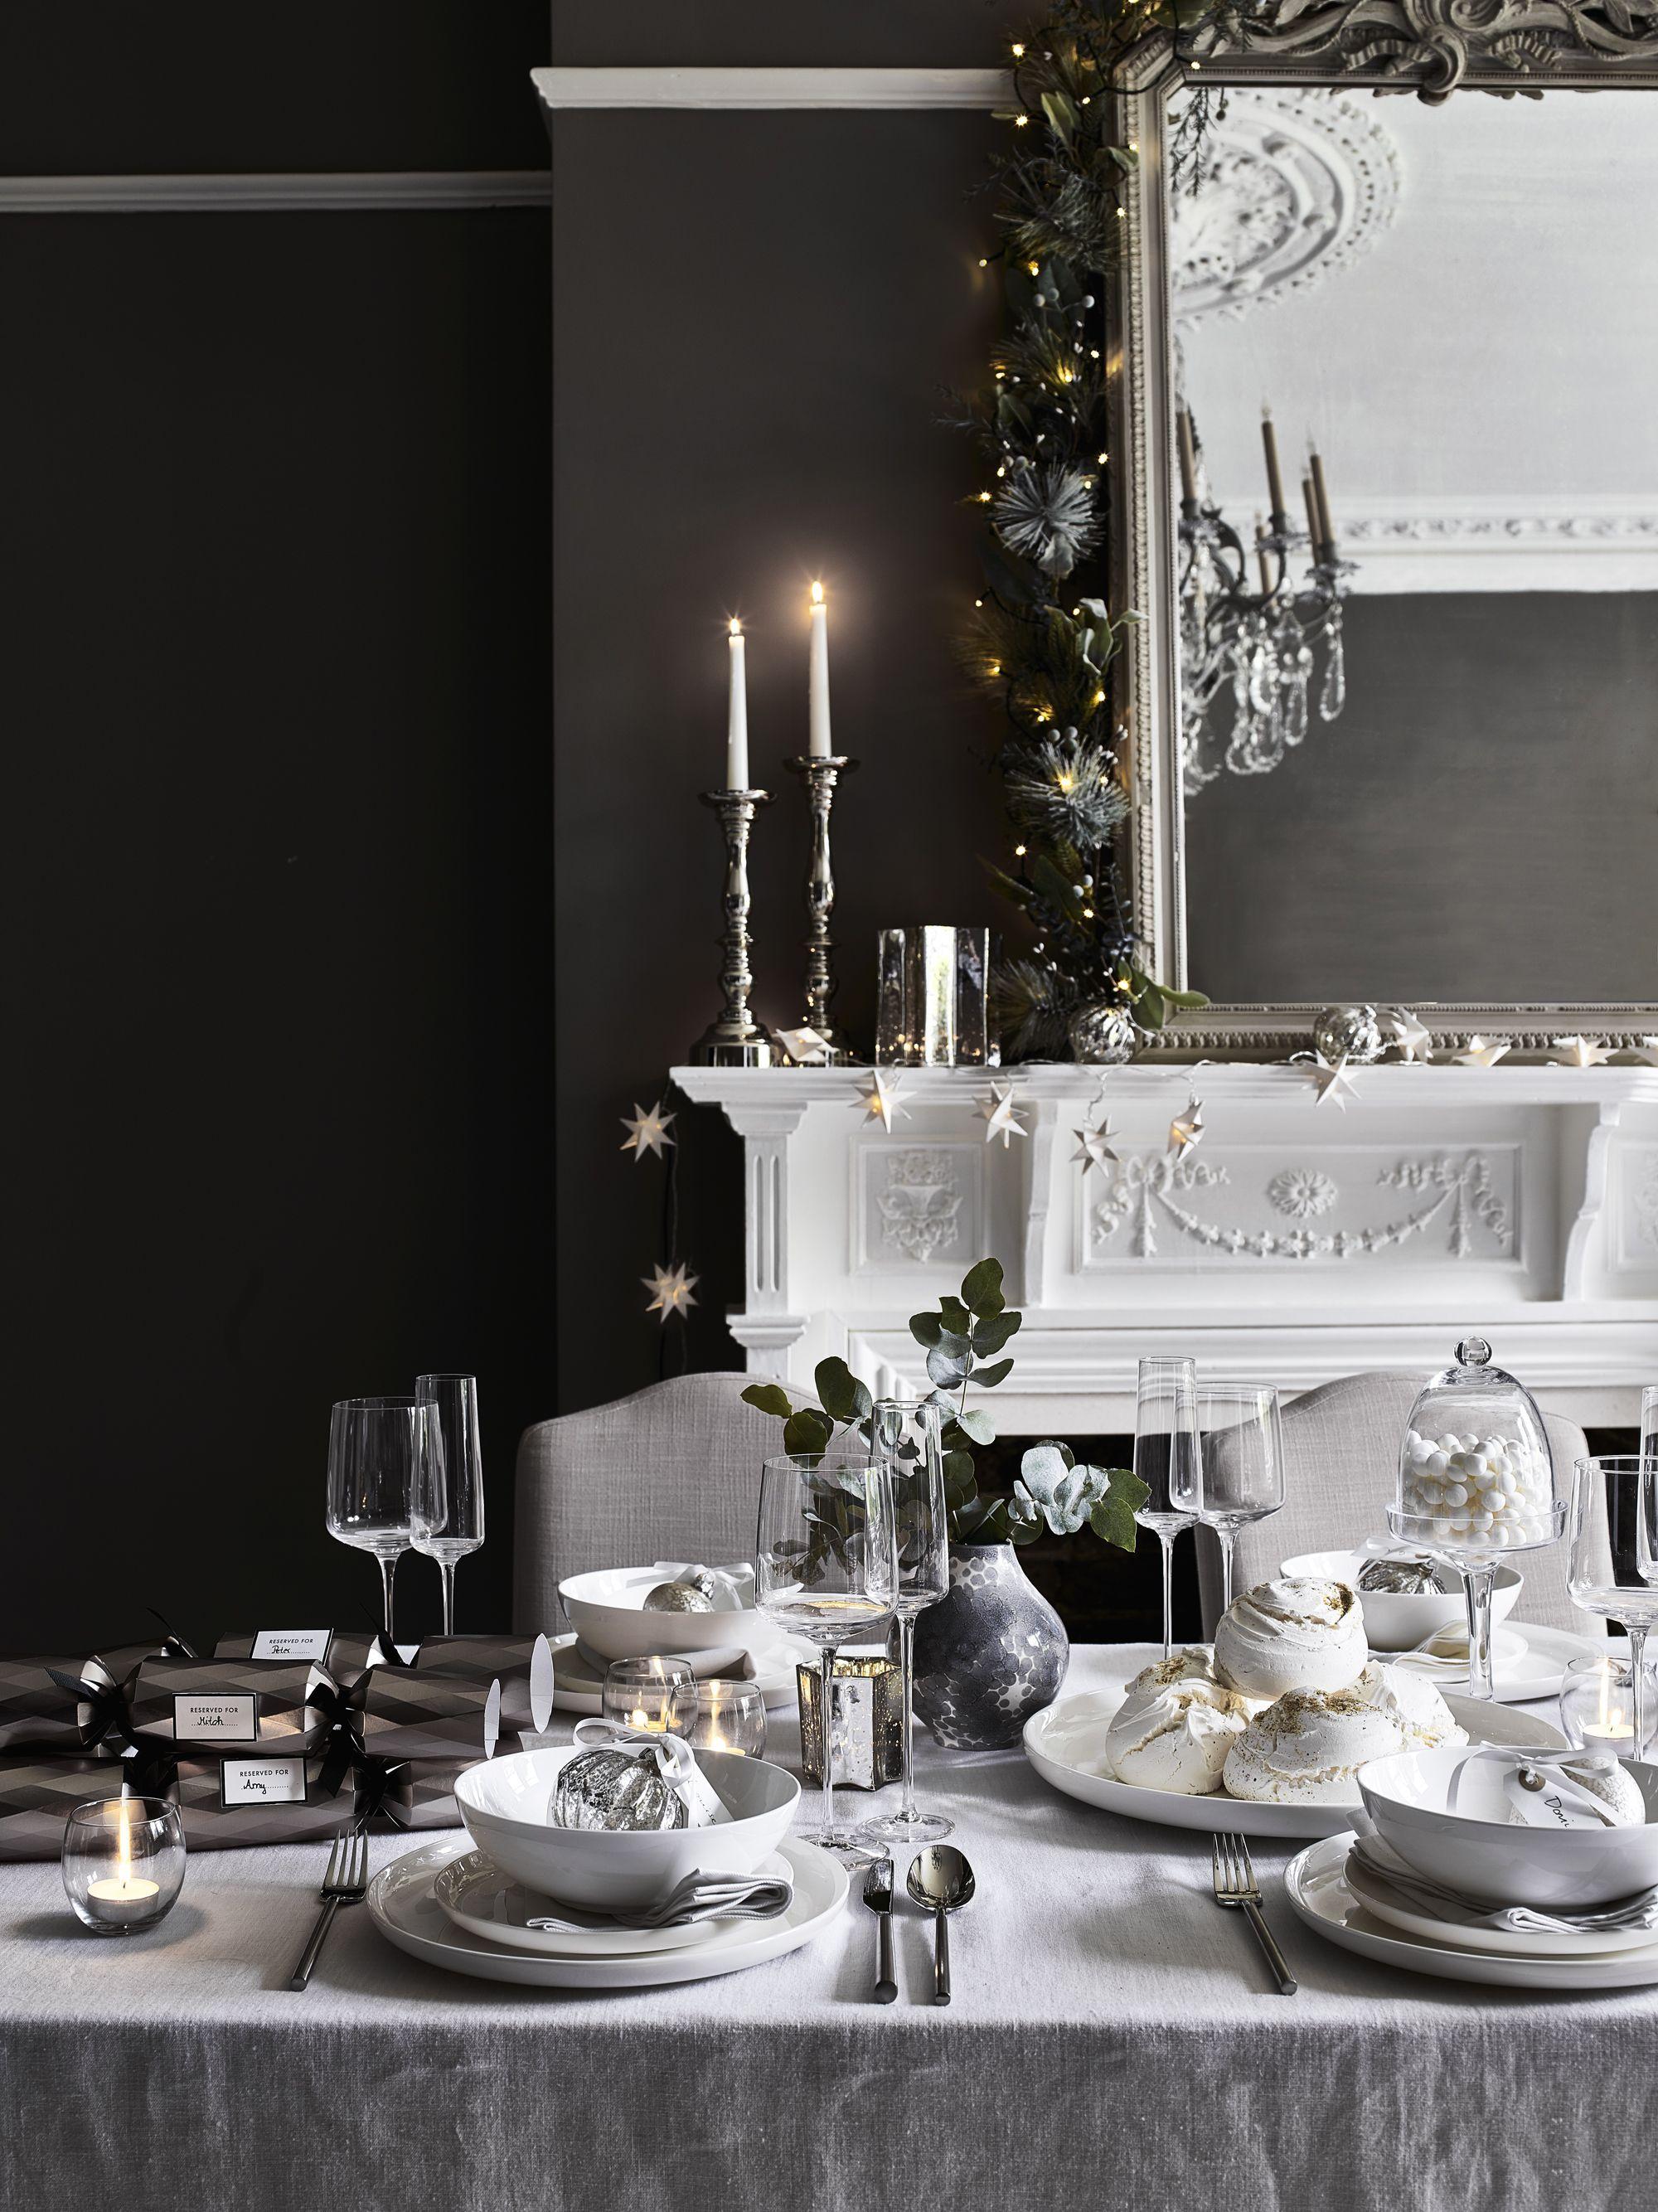 House of Fraser Bring Merry Back